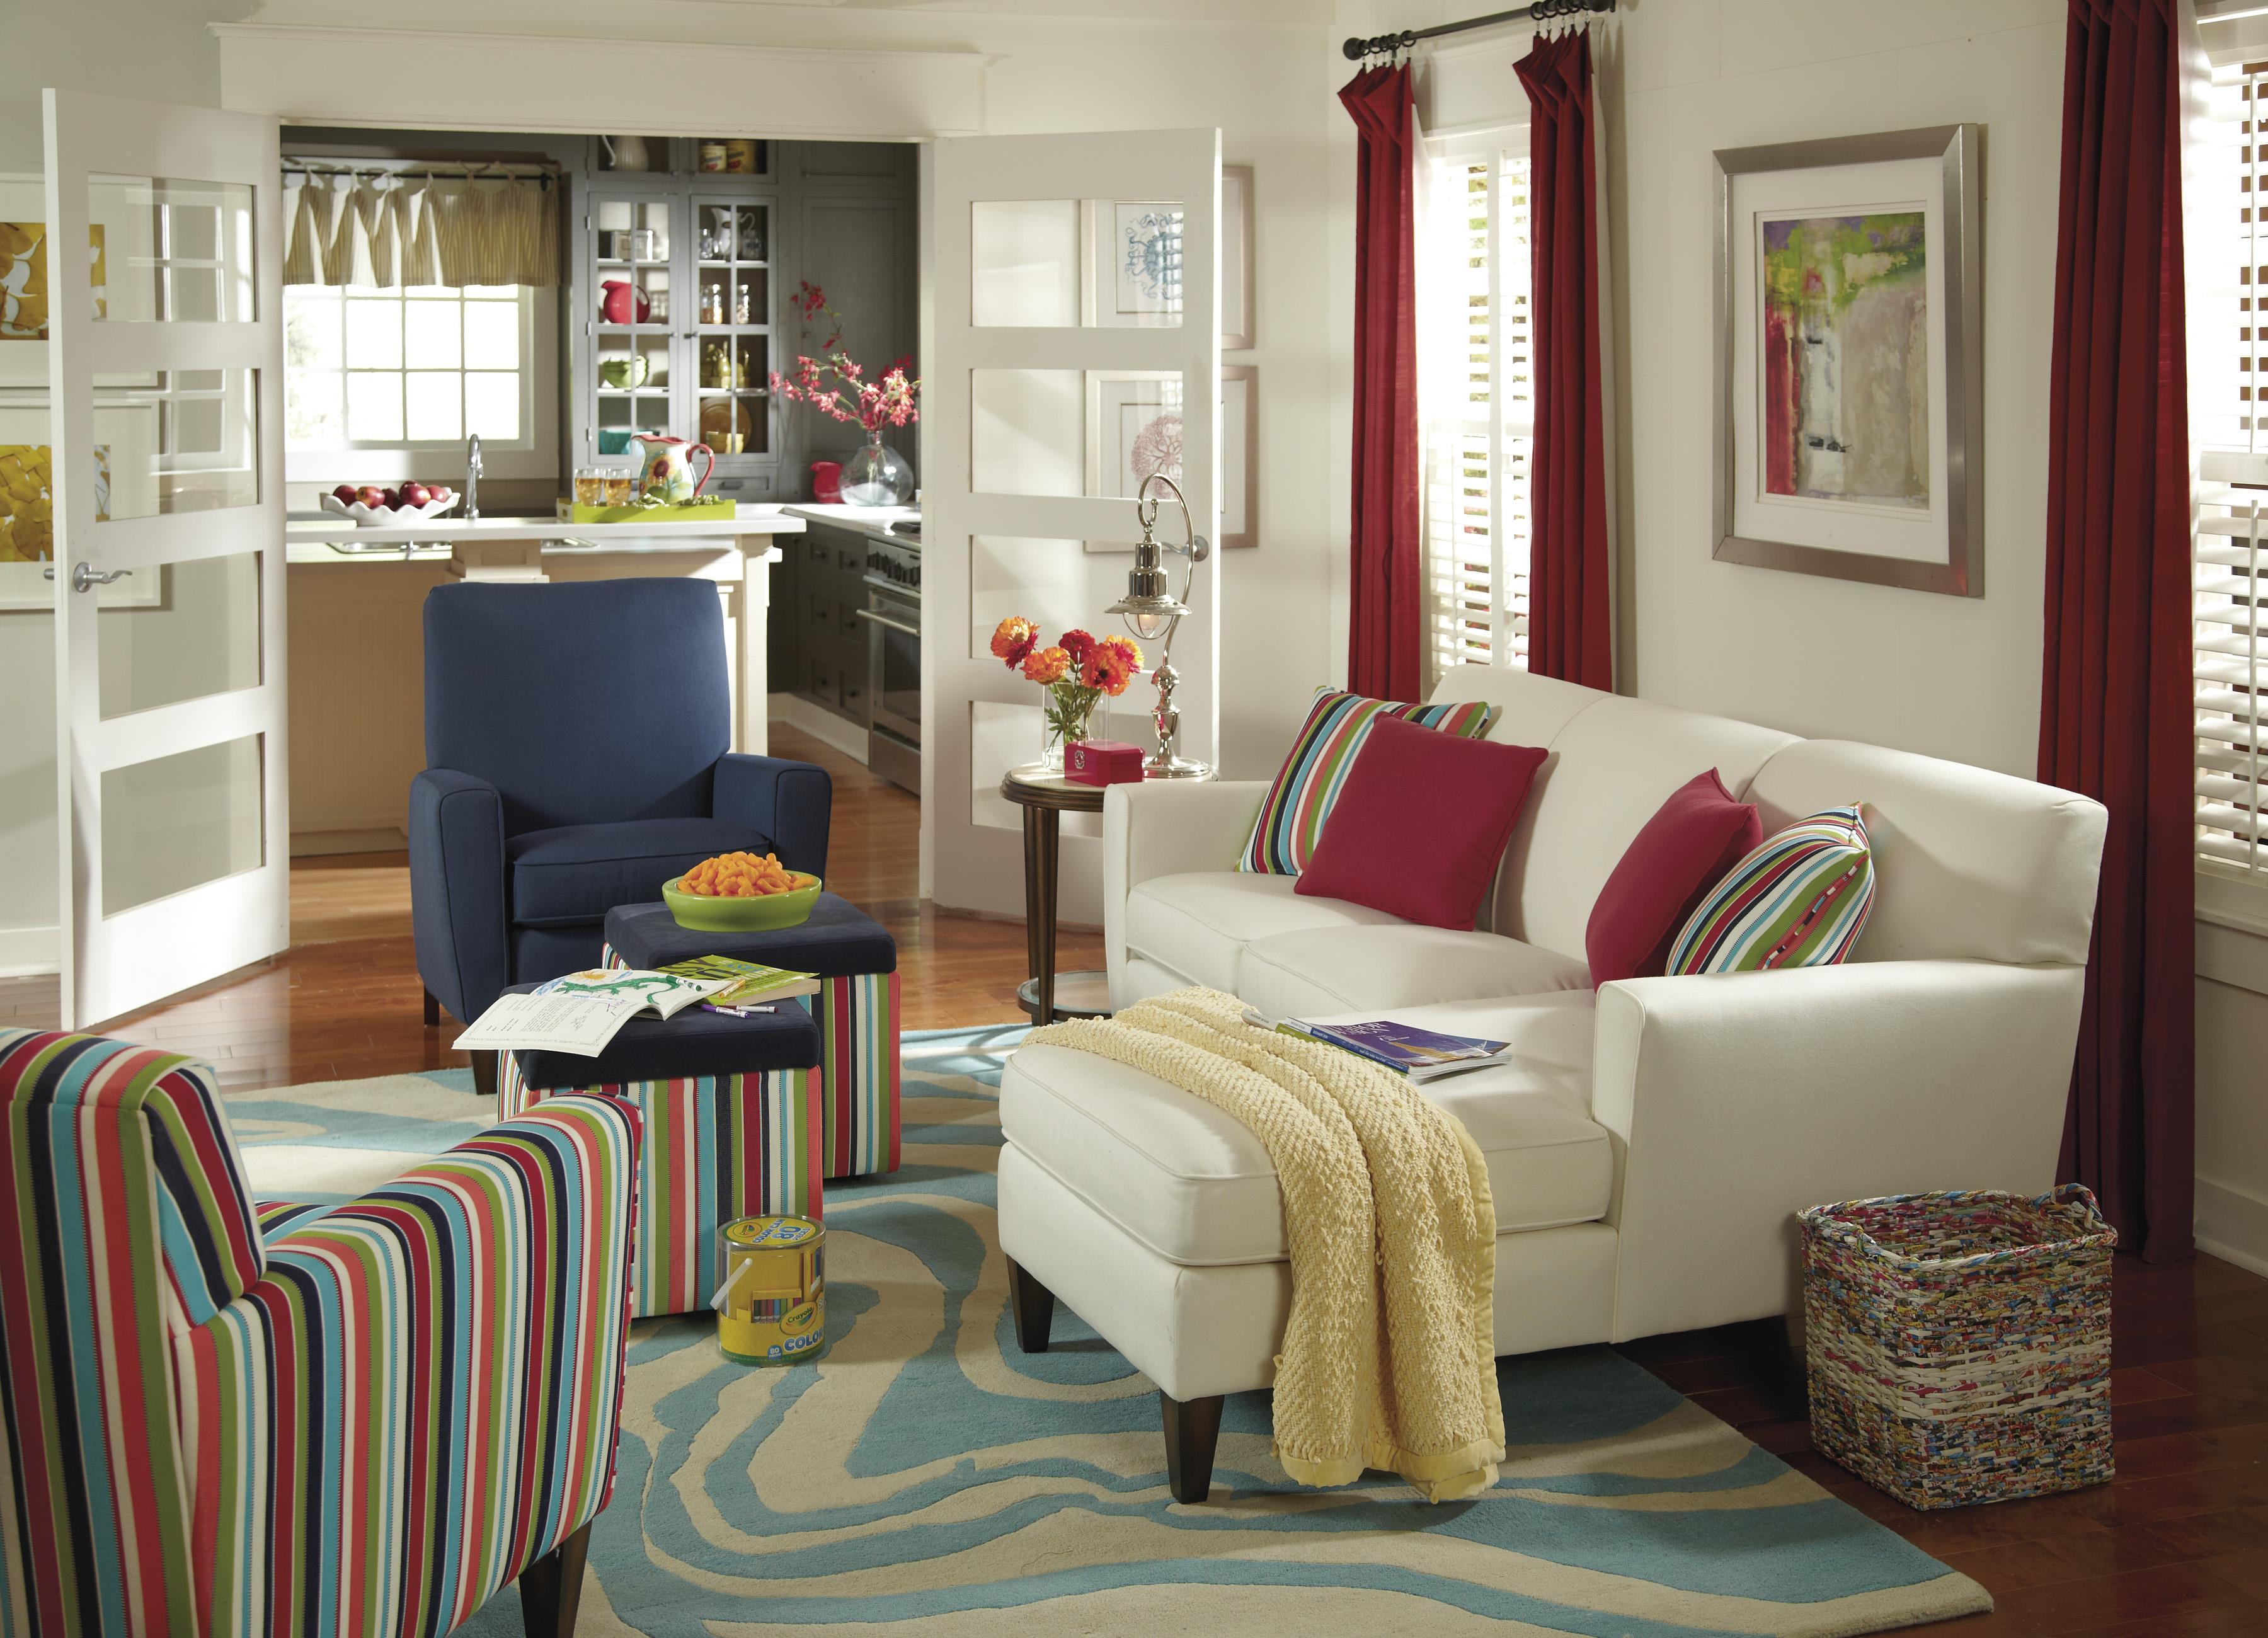 flexsteel sofa sets the dump atlanta sofas digby stationary living room group dunk bright